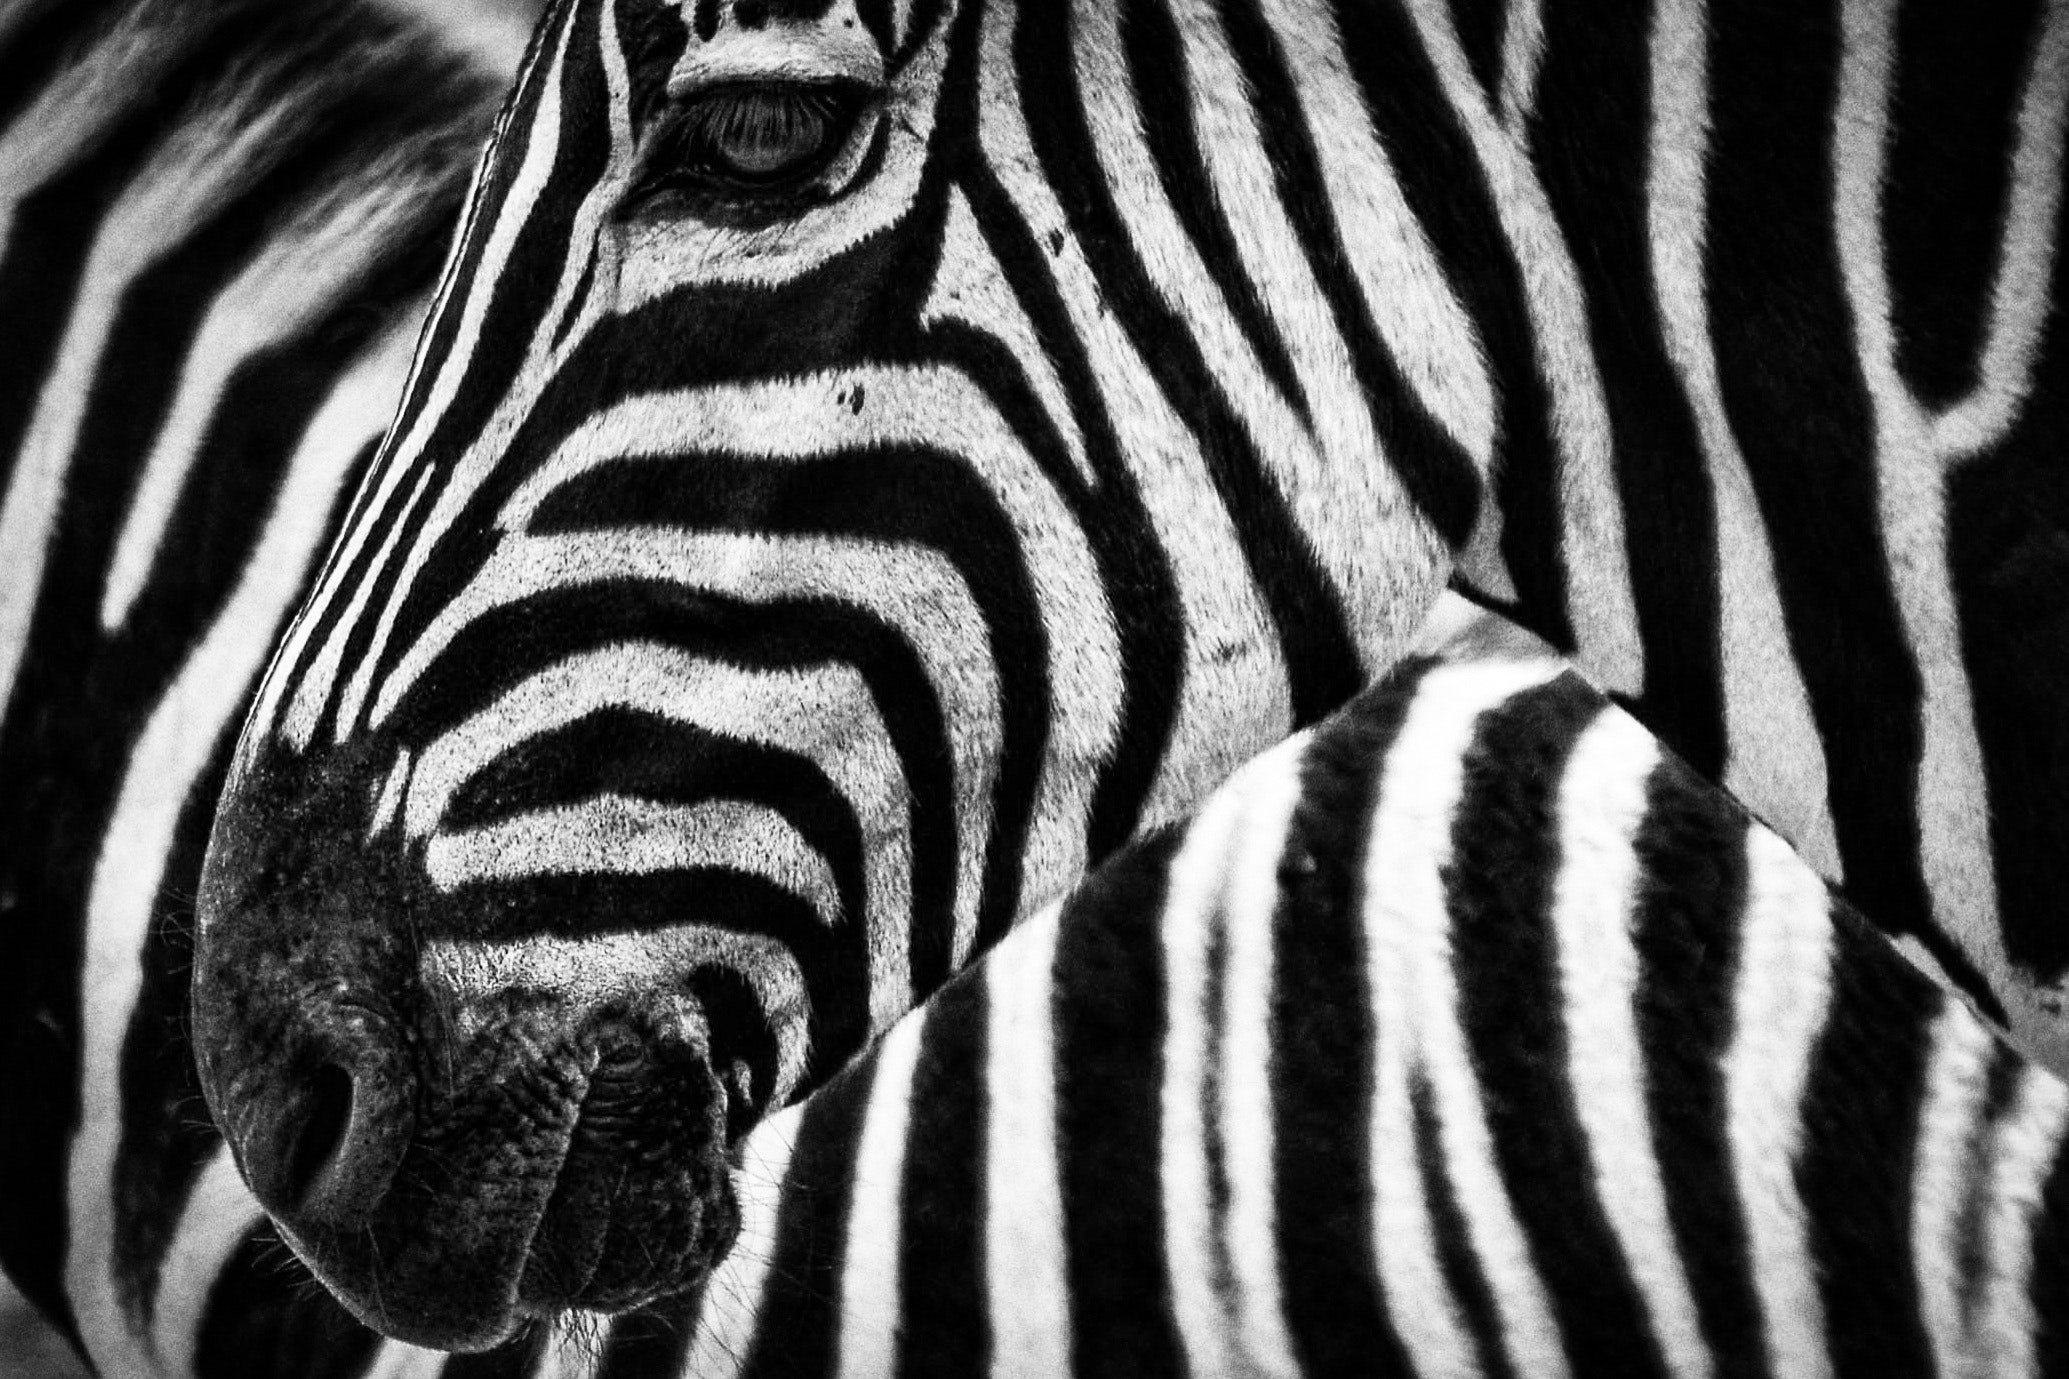 animal-animal-photography-black-and-white-47349